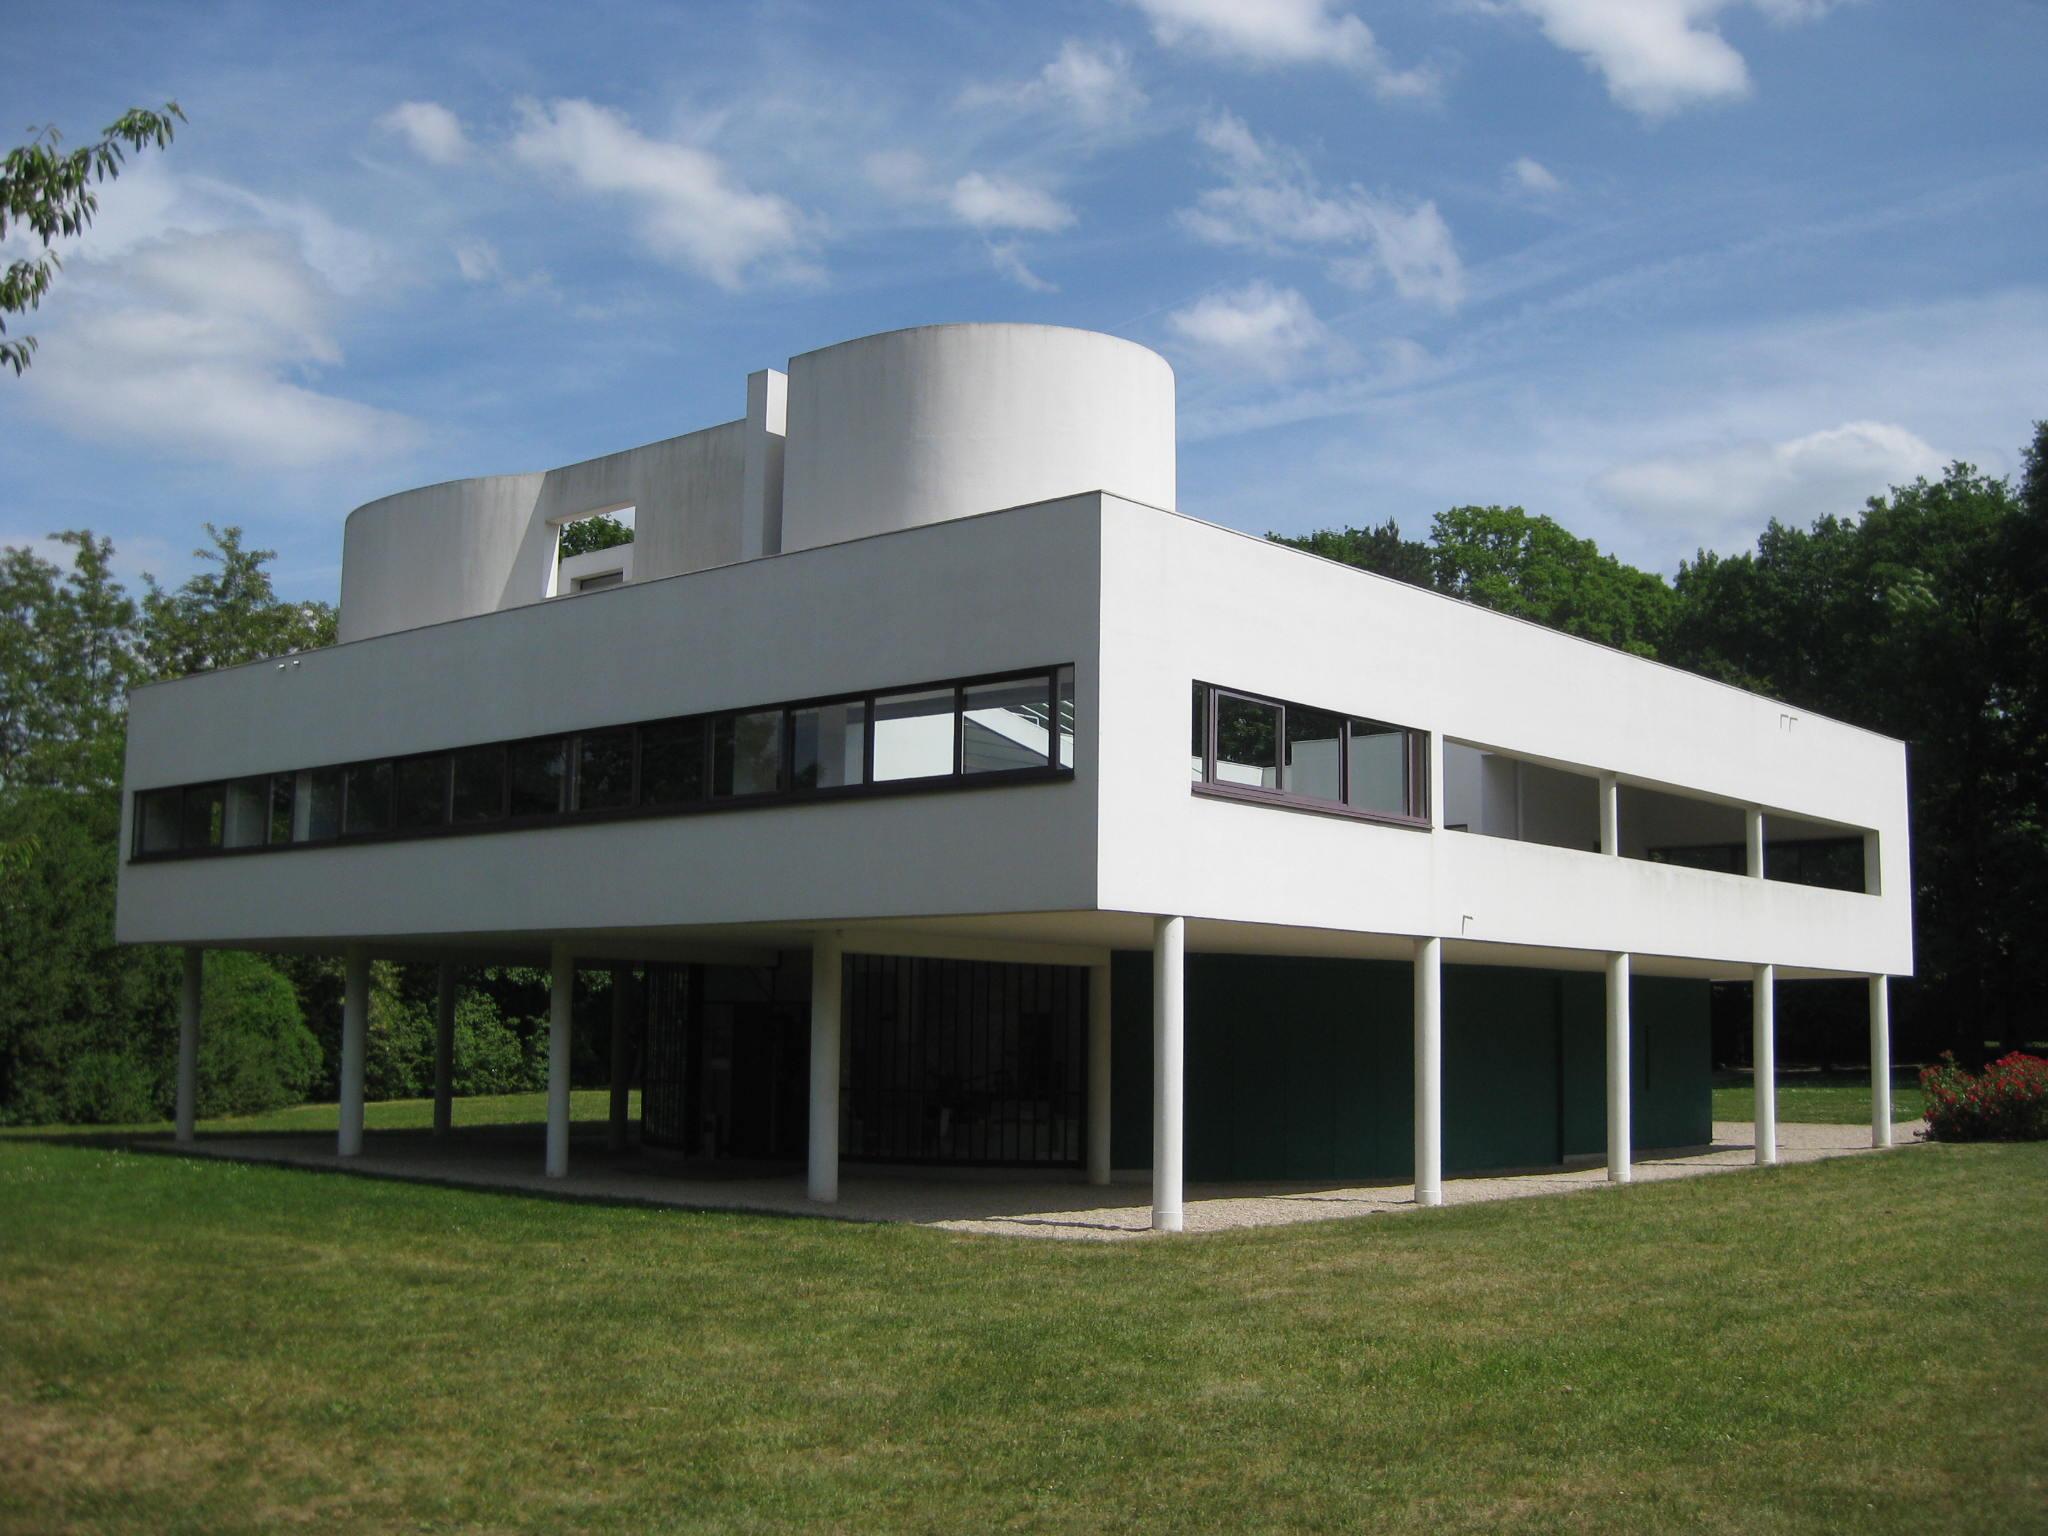 Villa Savoye Webner House